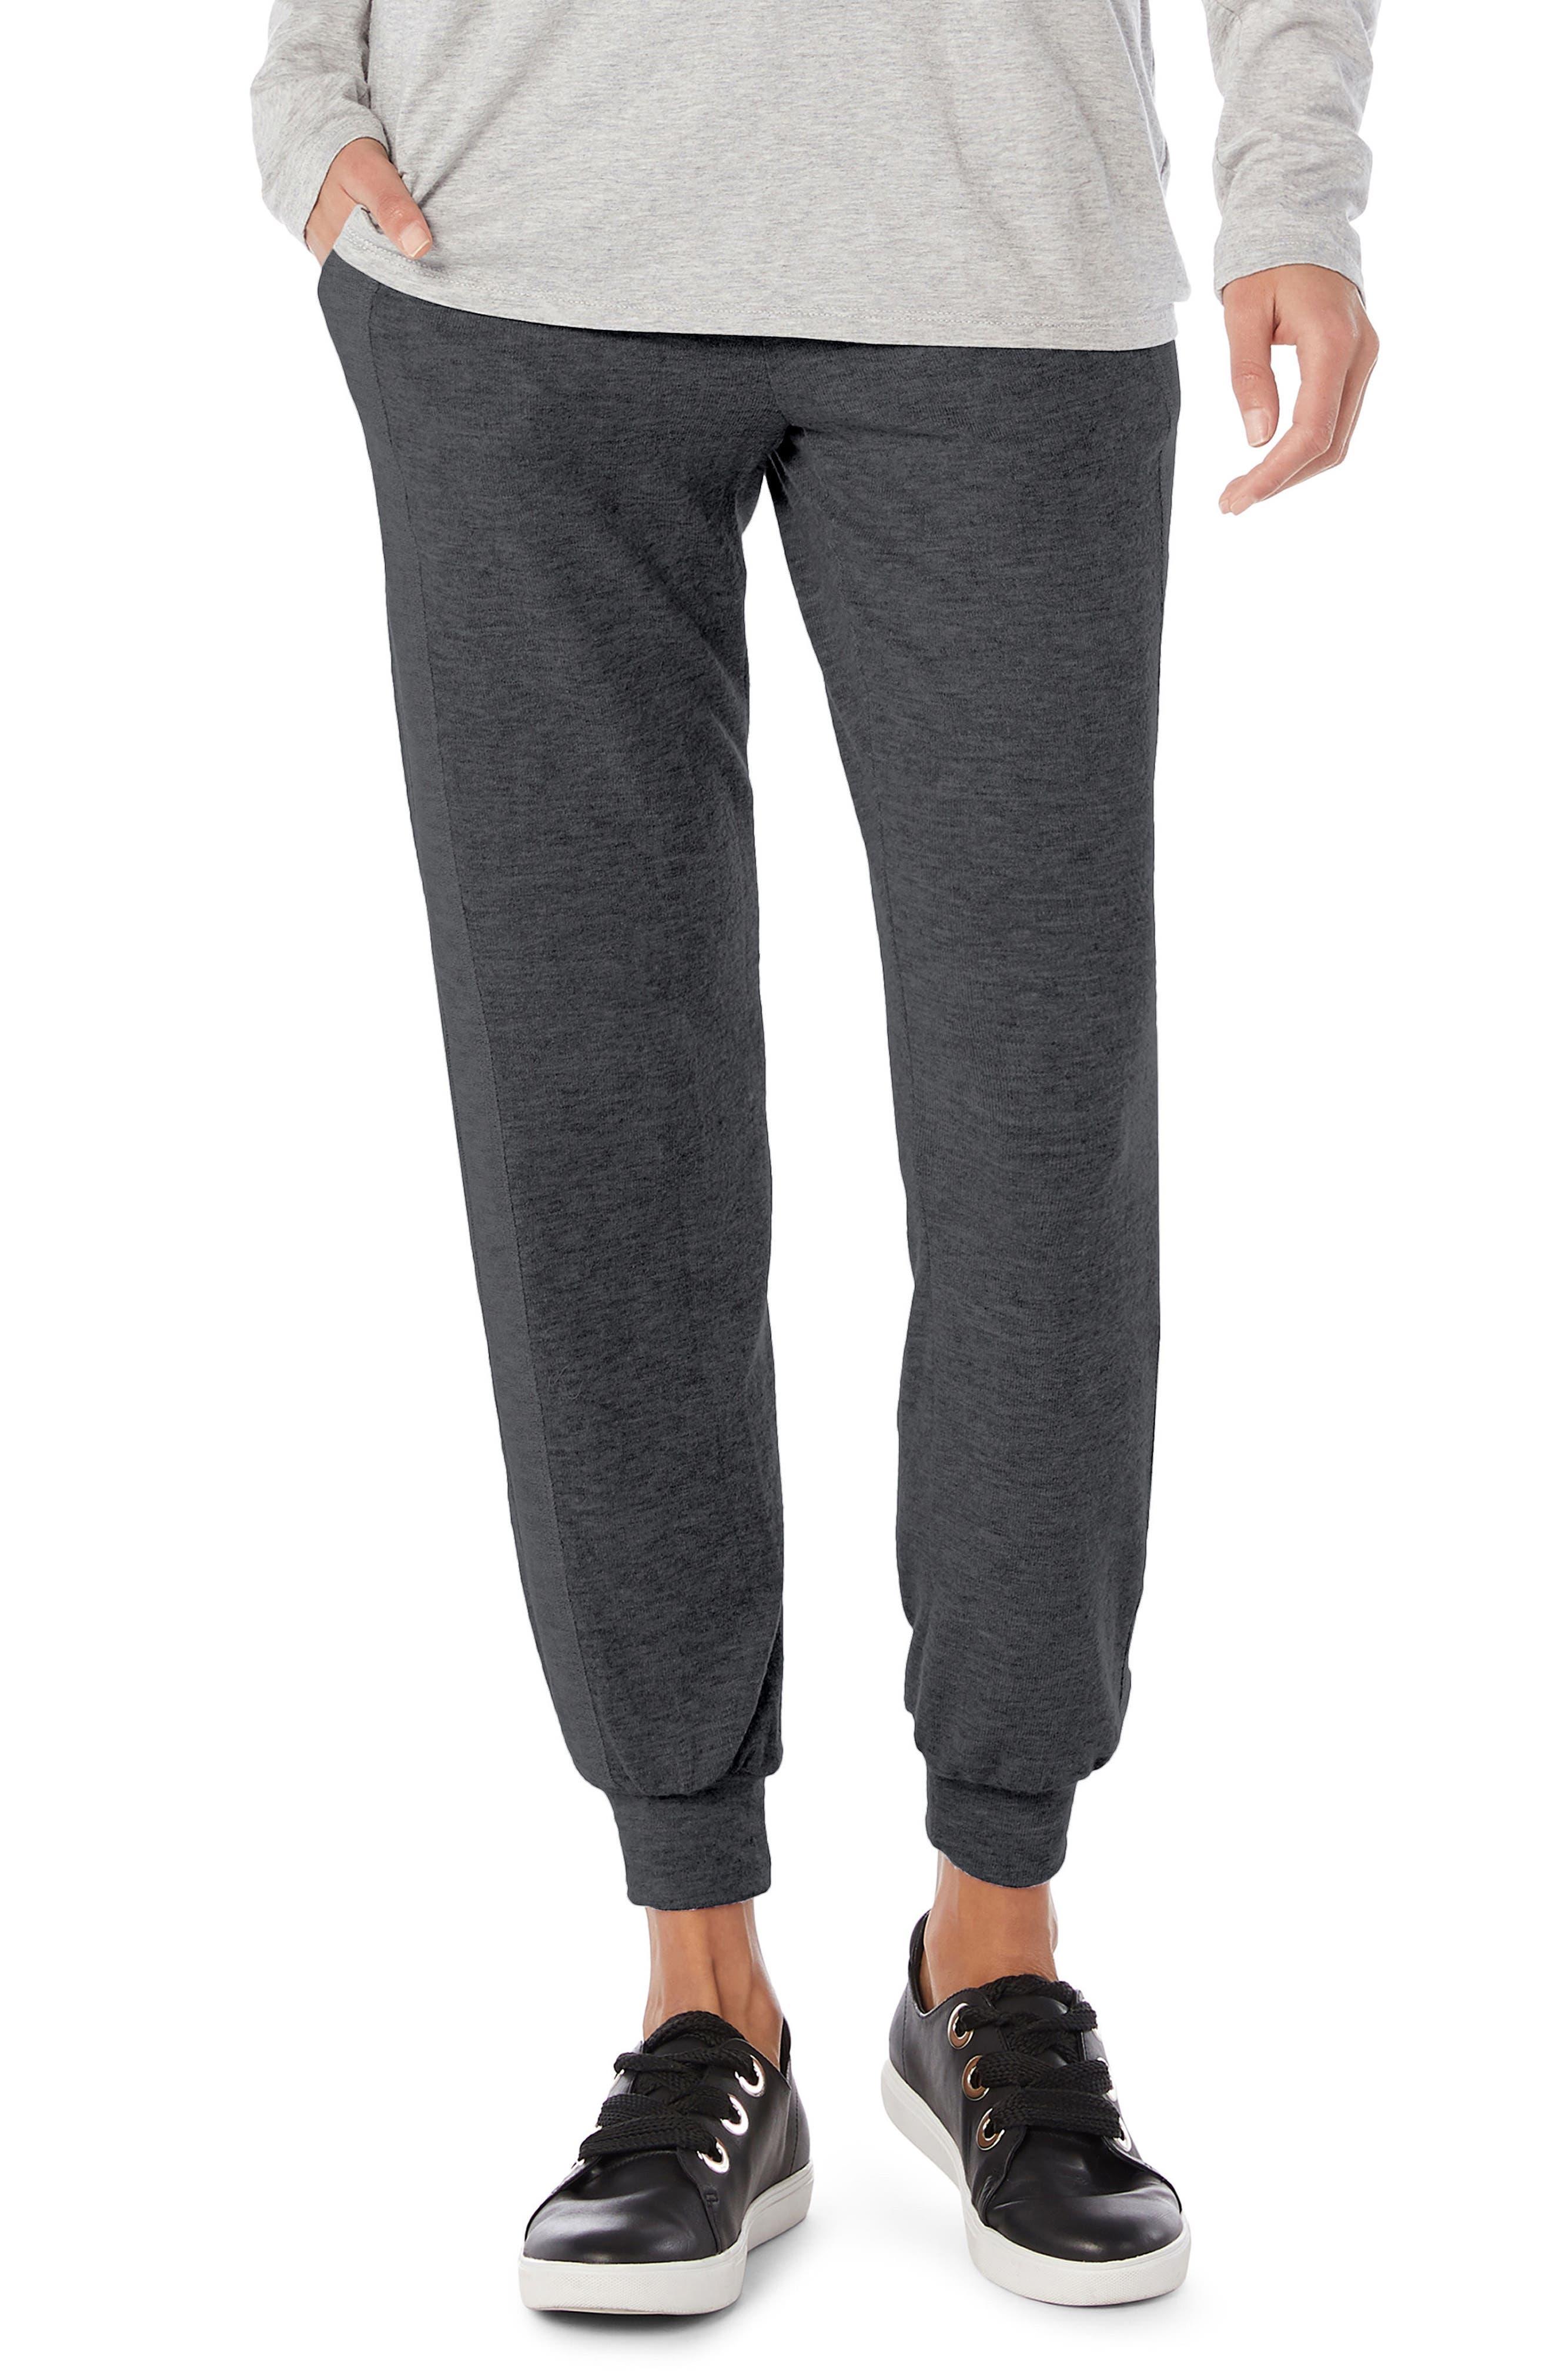 Drawstring Pull-on Pants,                         Main,                         color, Charcoal